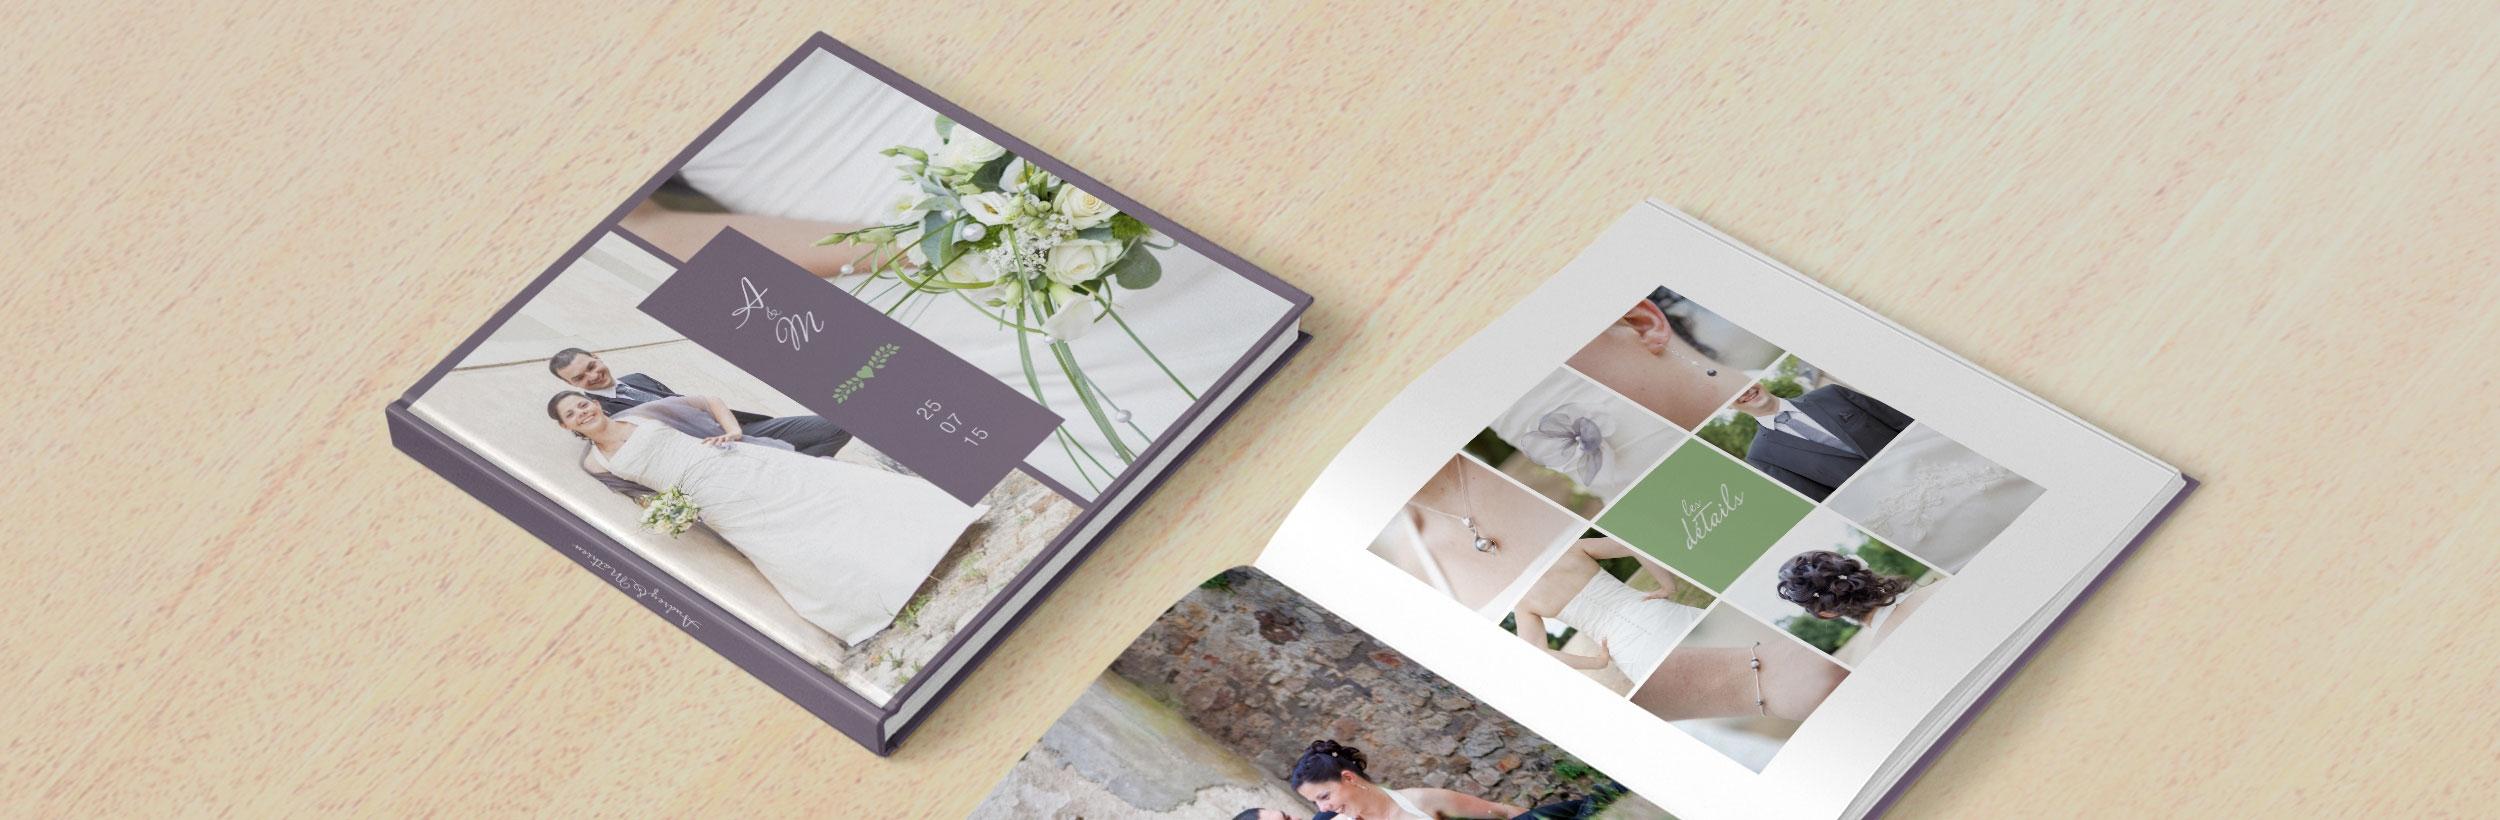 particuliers-creas-albums-photos-pagetop